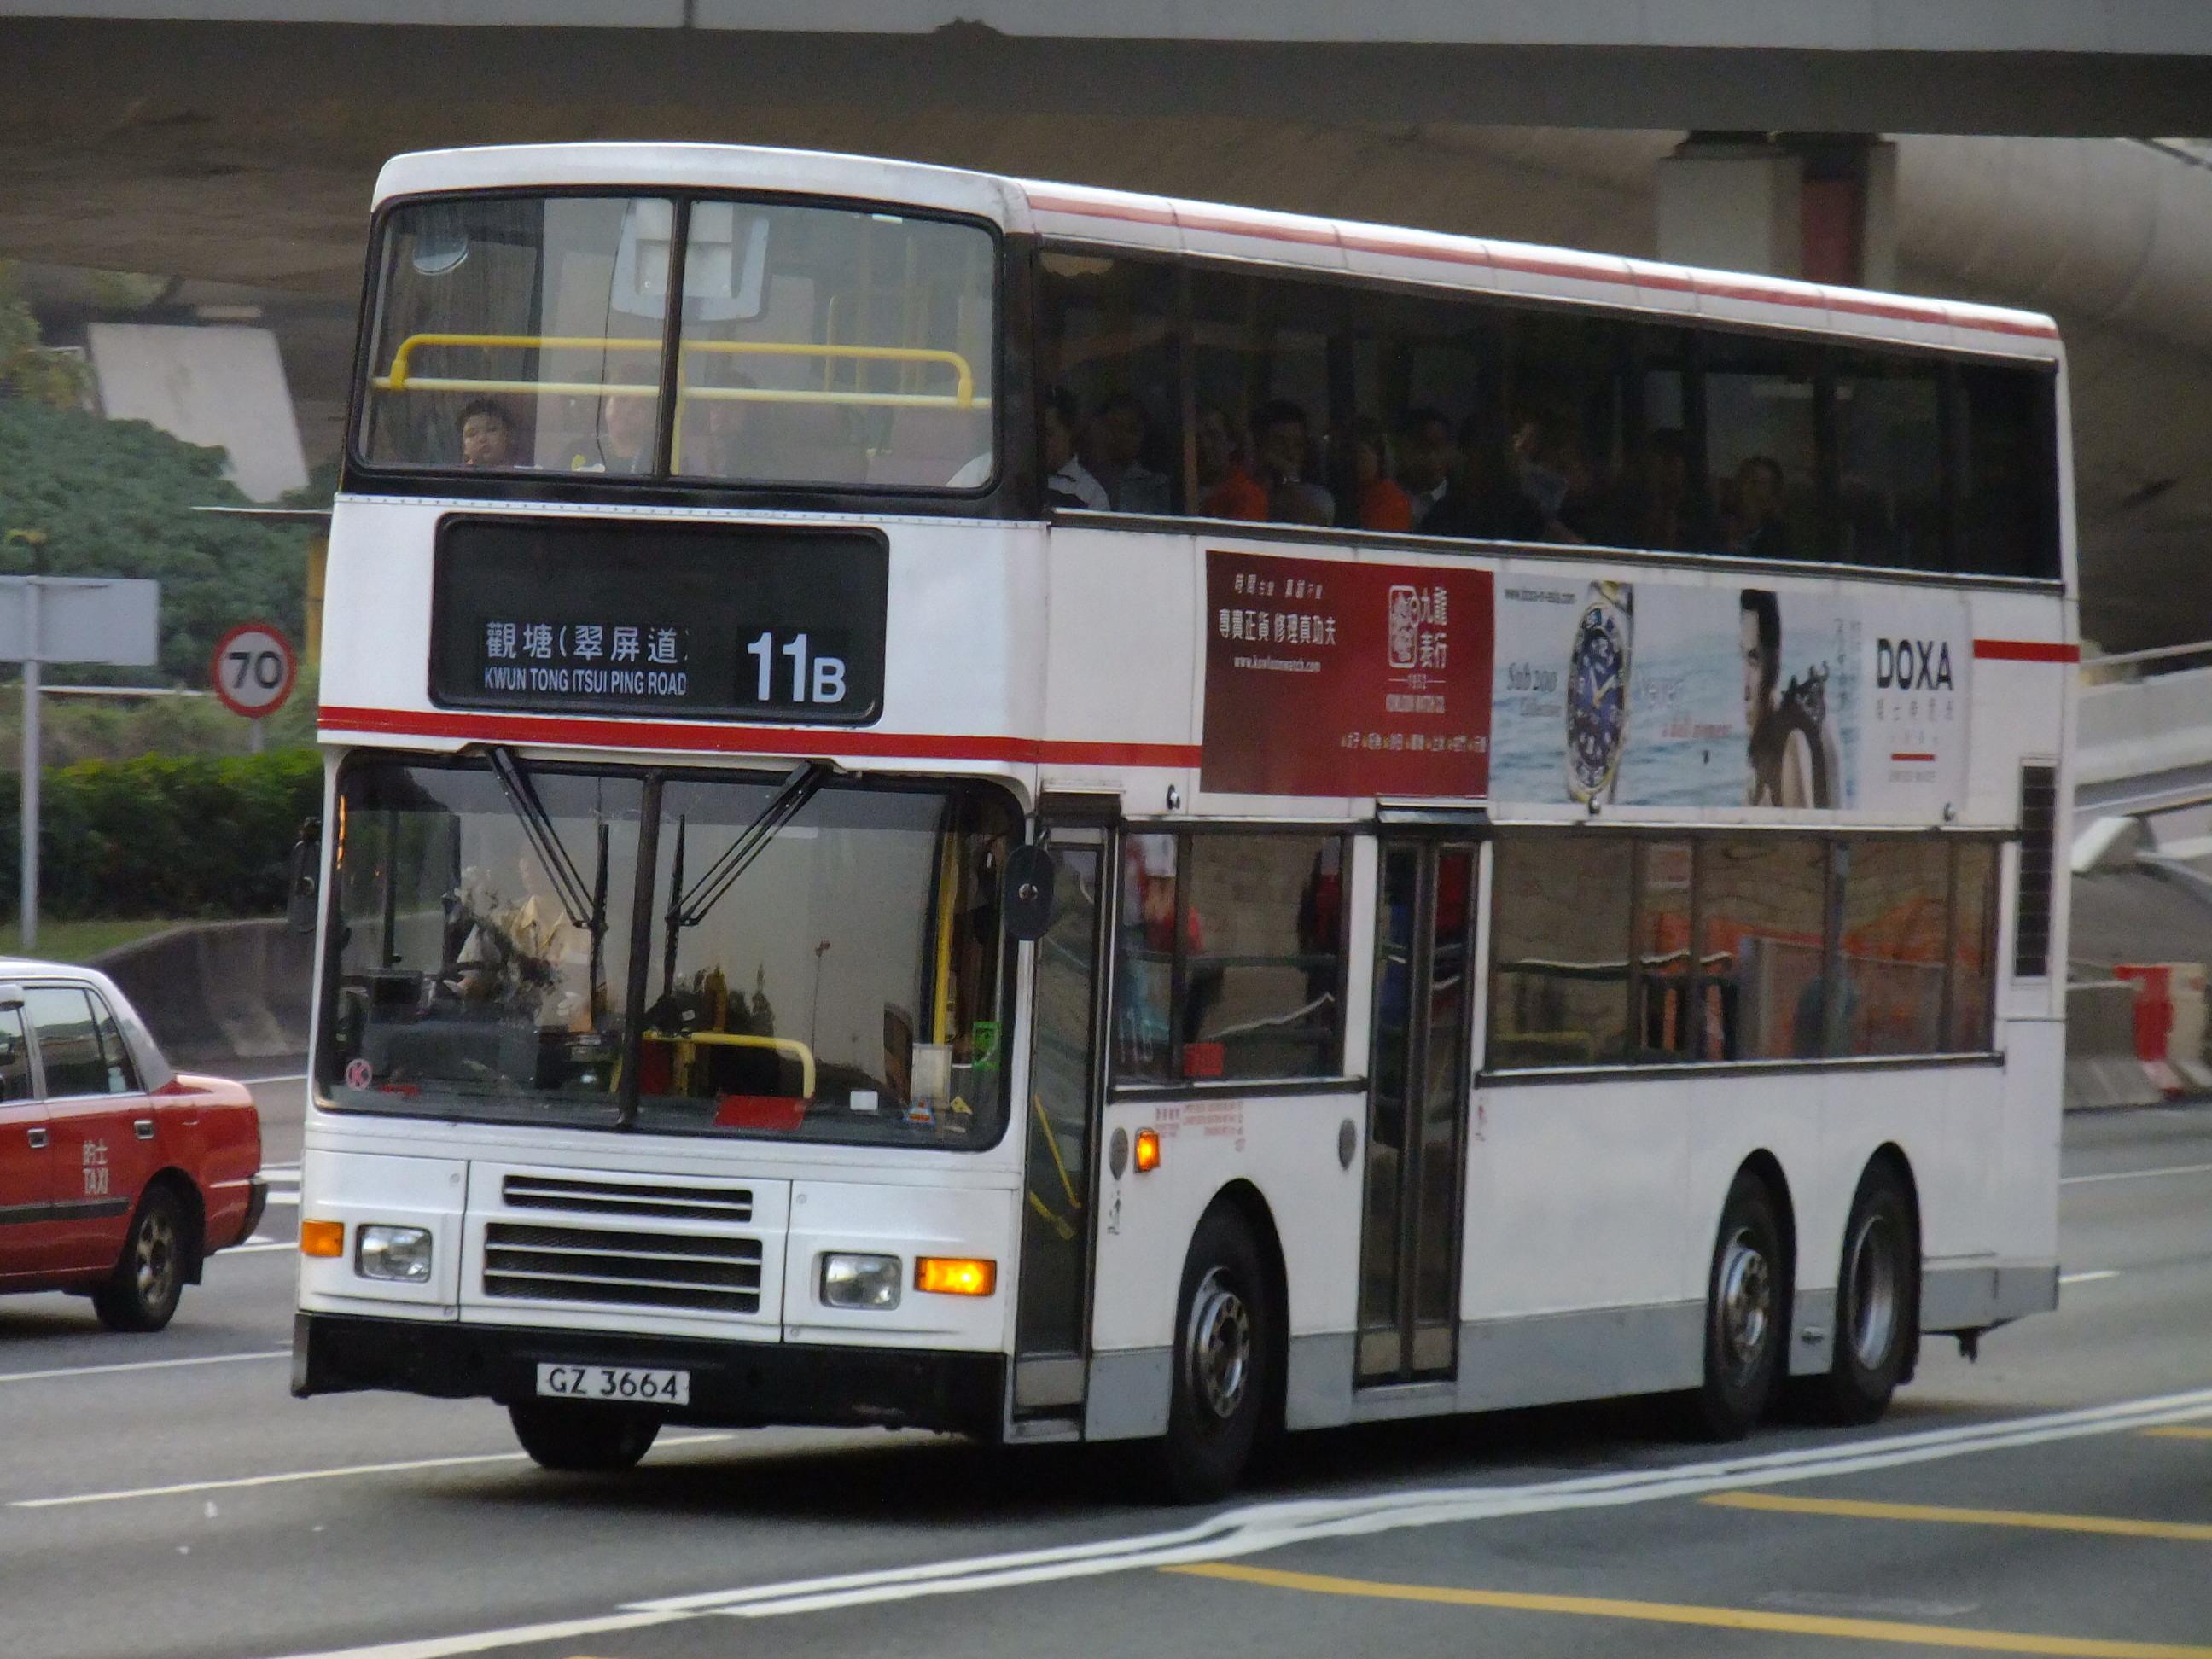 hong kong kmb bus route 11bjpg picture. Black Bedroom Furniture Sets. Home Design Ideas